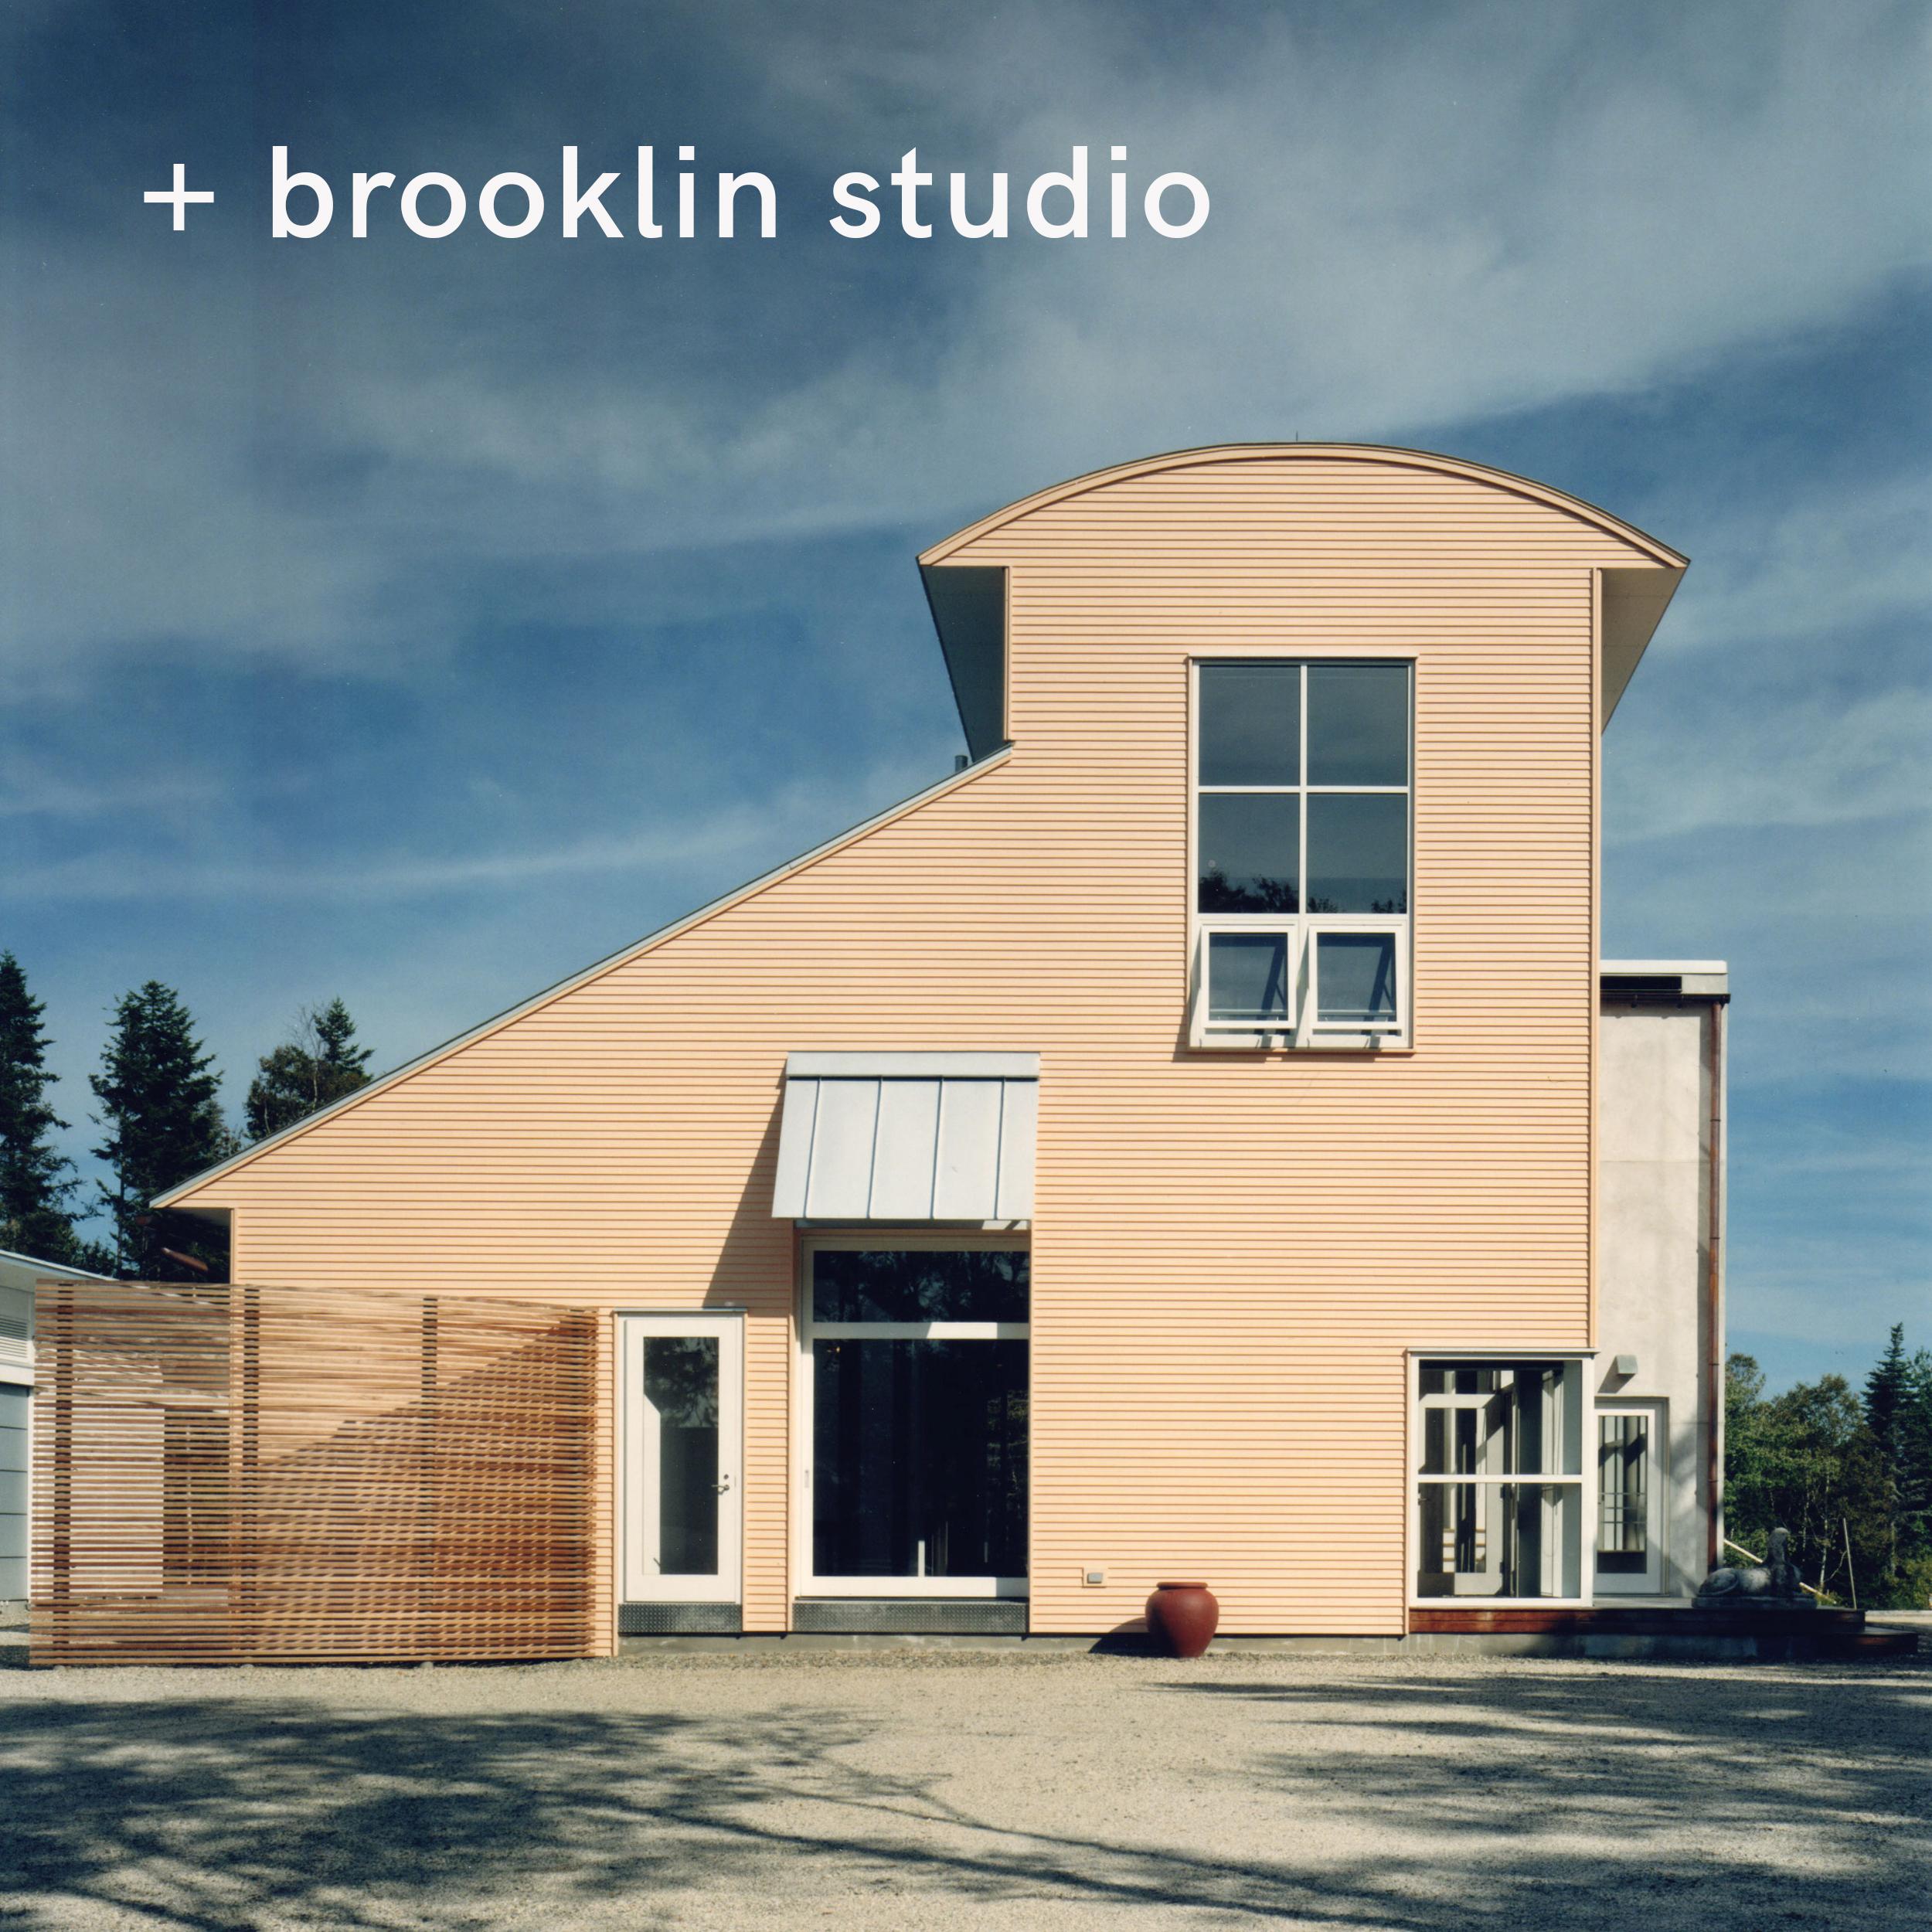 brooklin studio.jpg